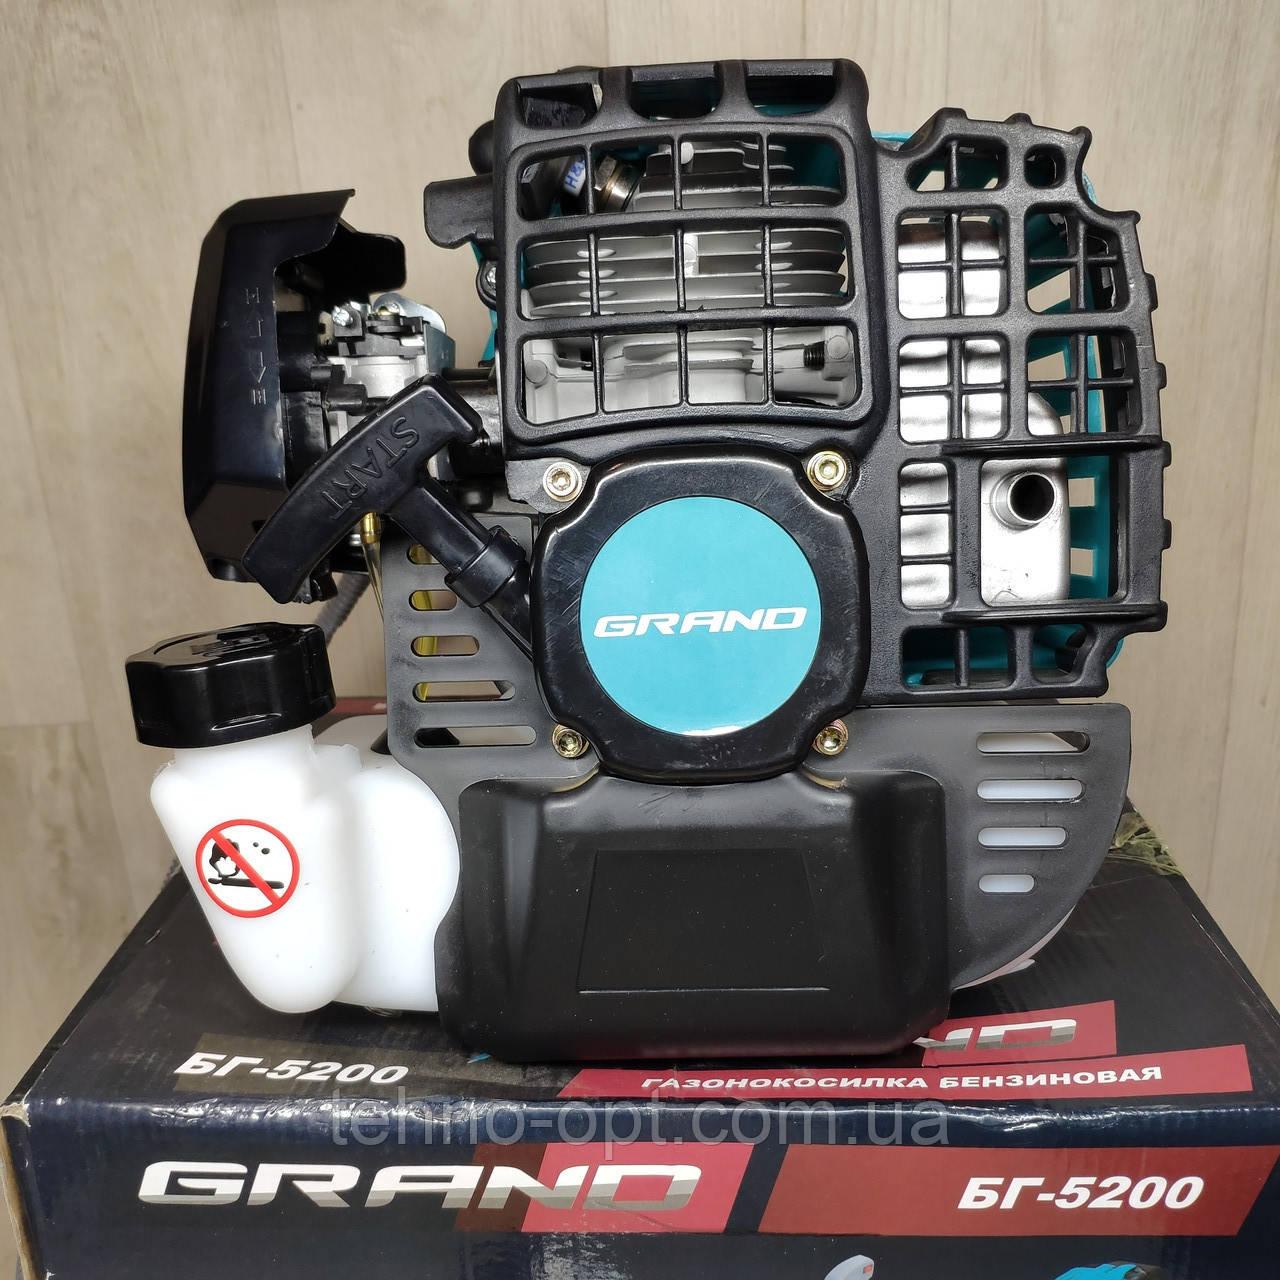 Бензокоса Grand БГ-5200